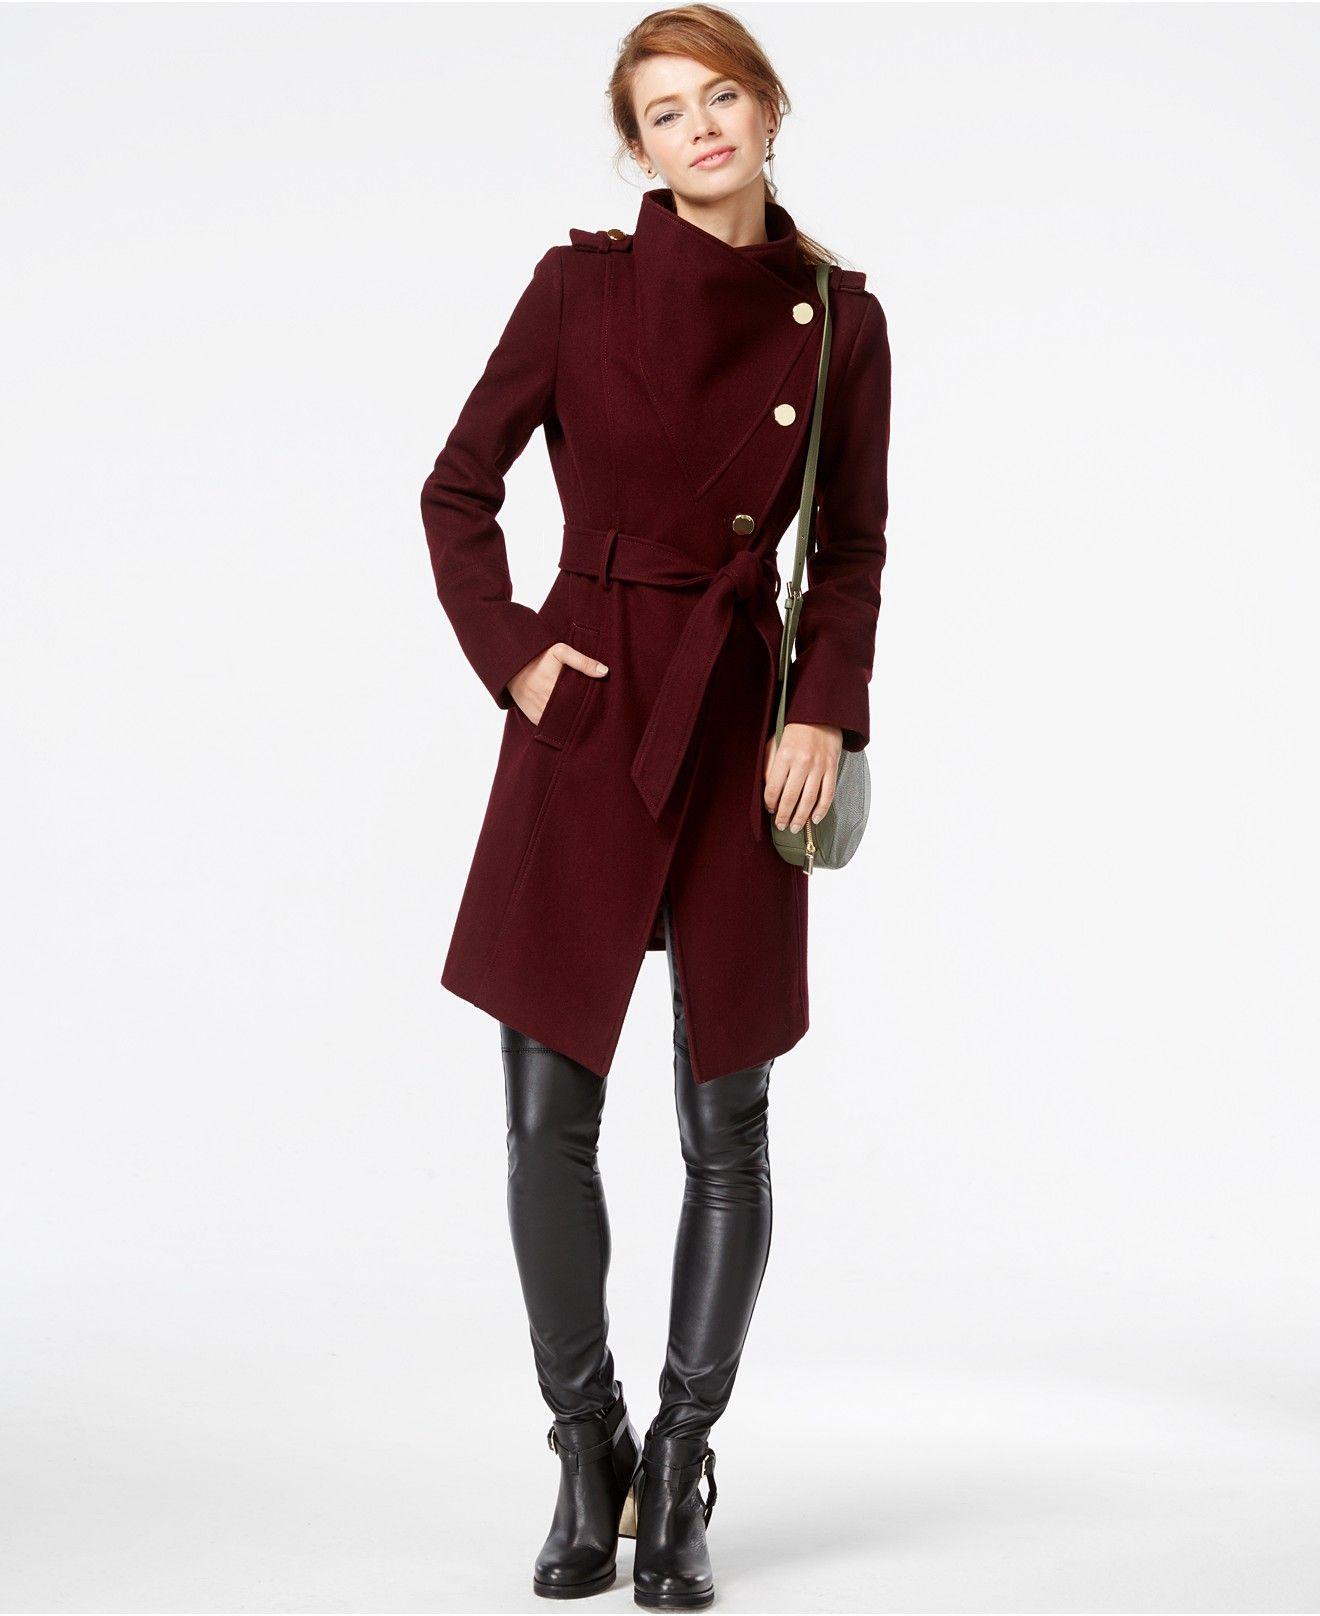 GUESS Funnel-Collar Asymmetrical Coat - GUESS Coats & Jackets ...